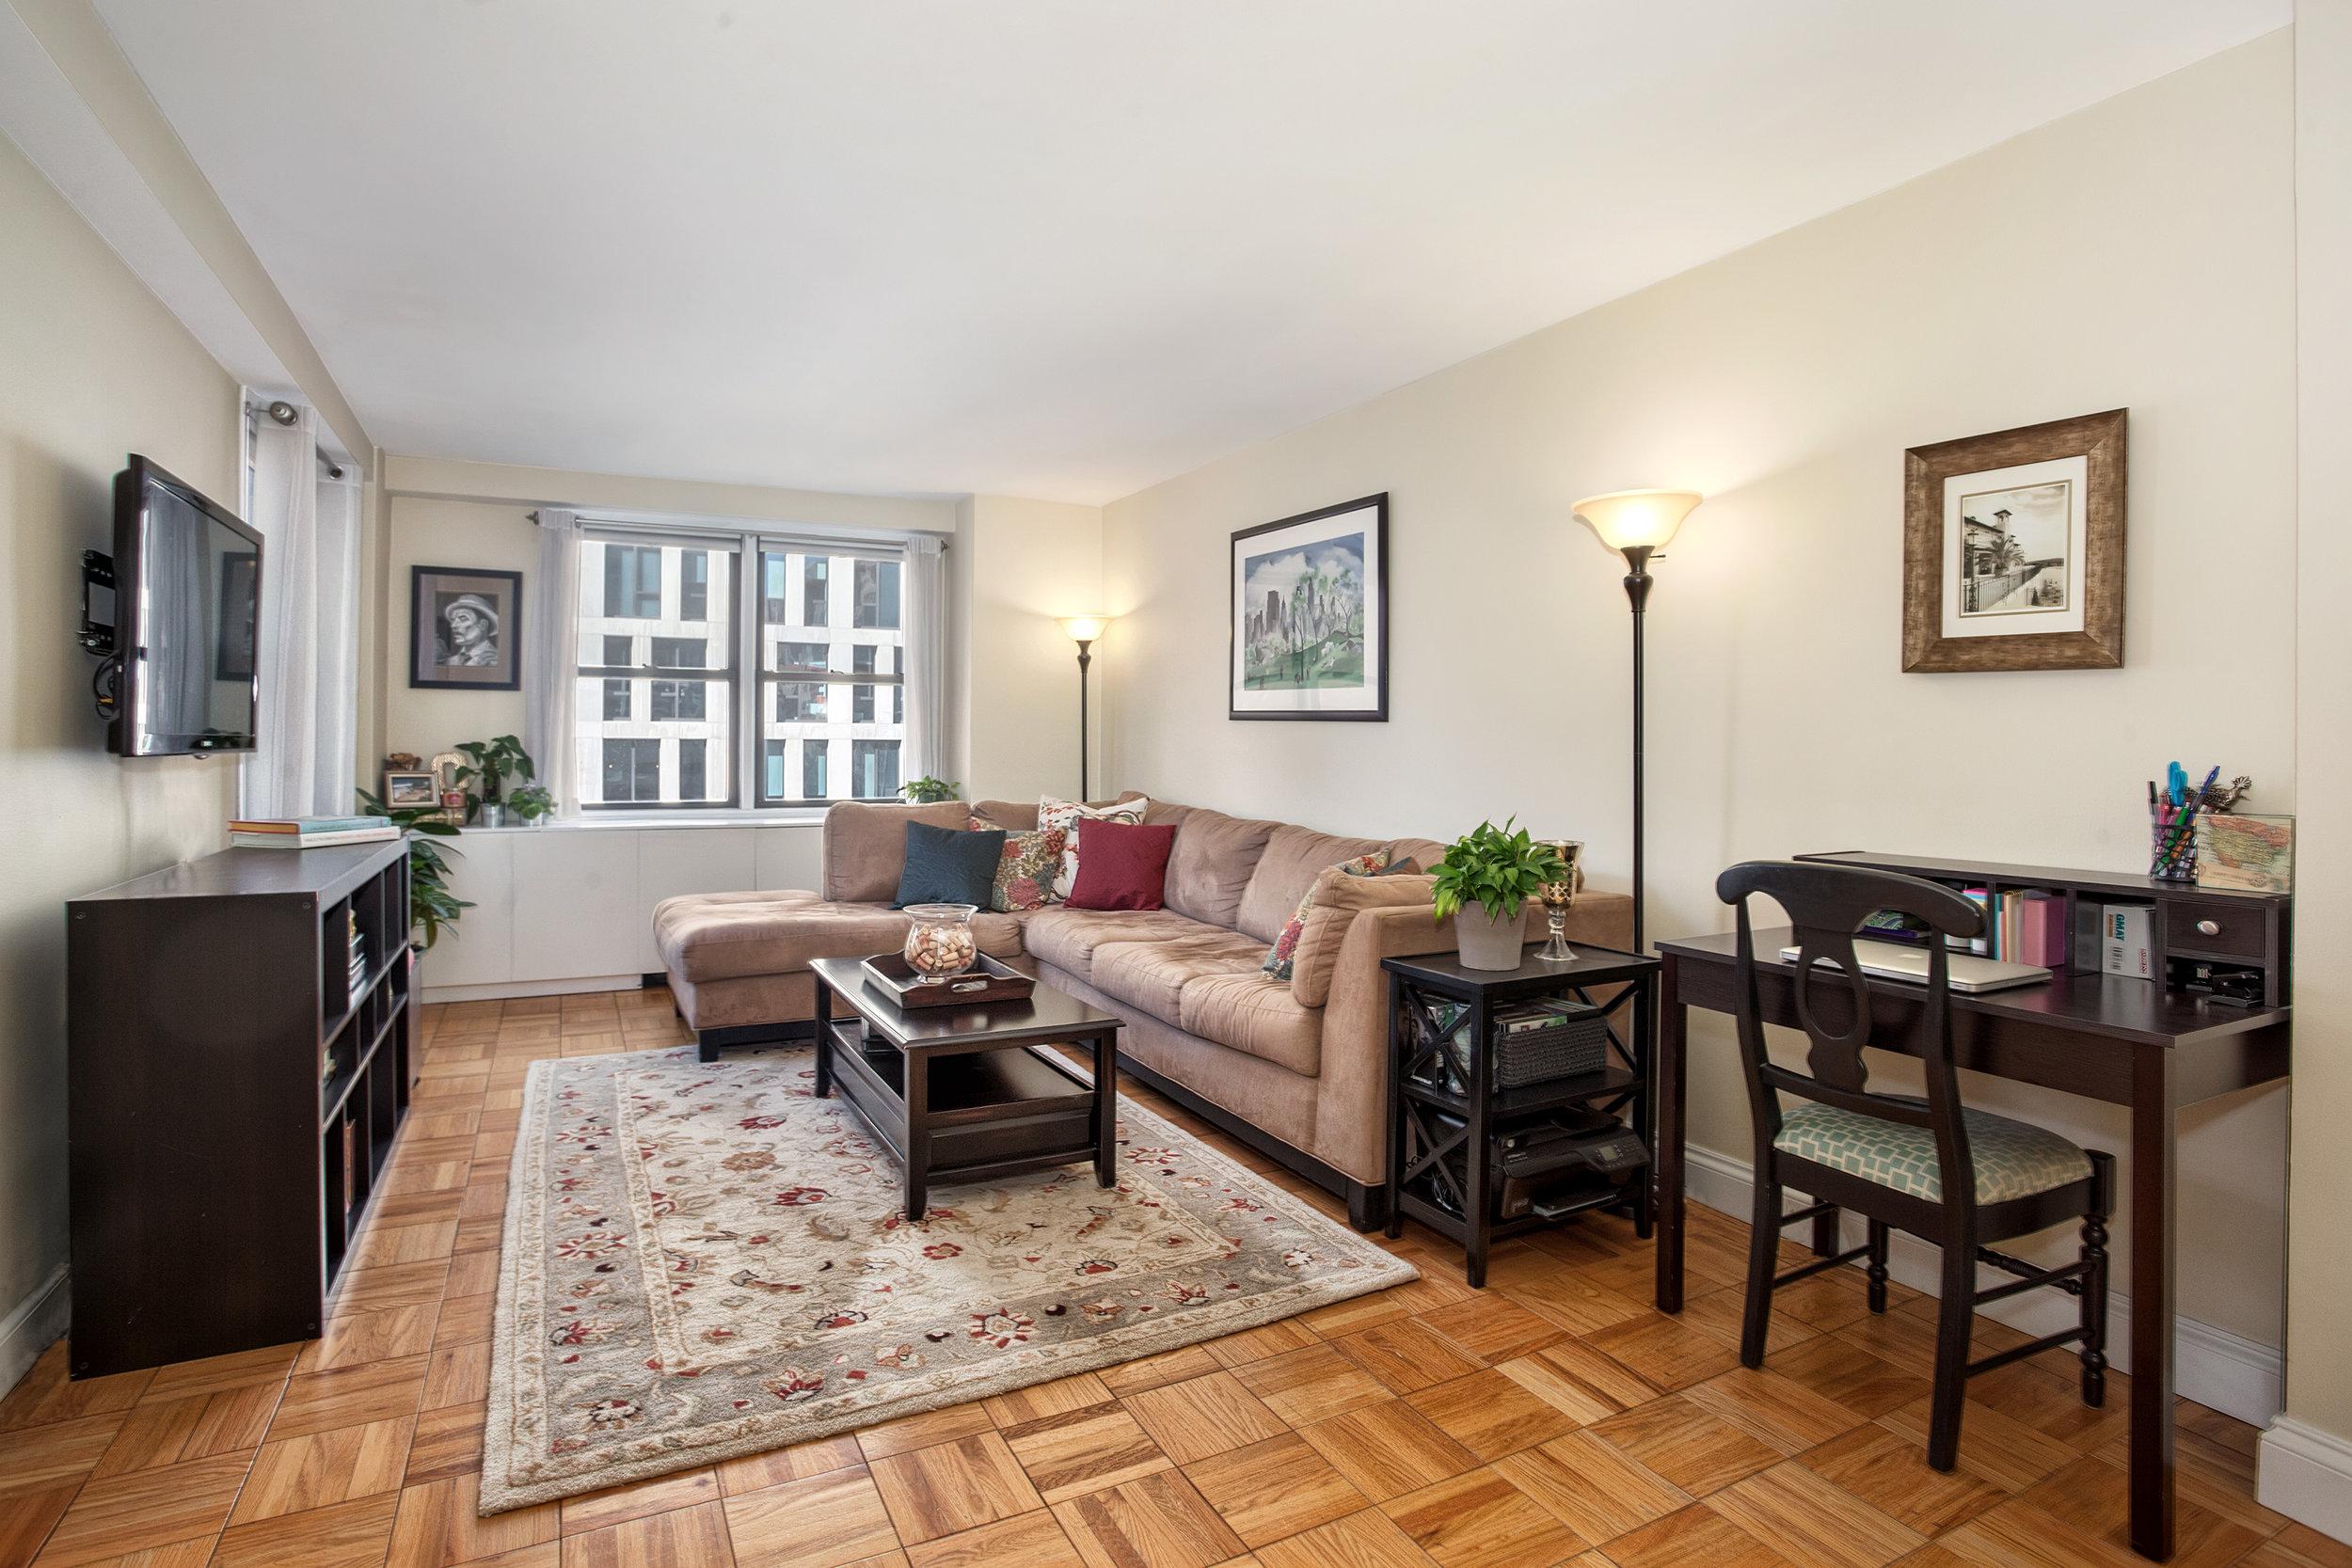 201 East 21st Street, #7D - $799,000